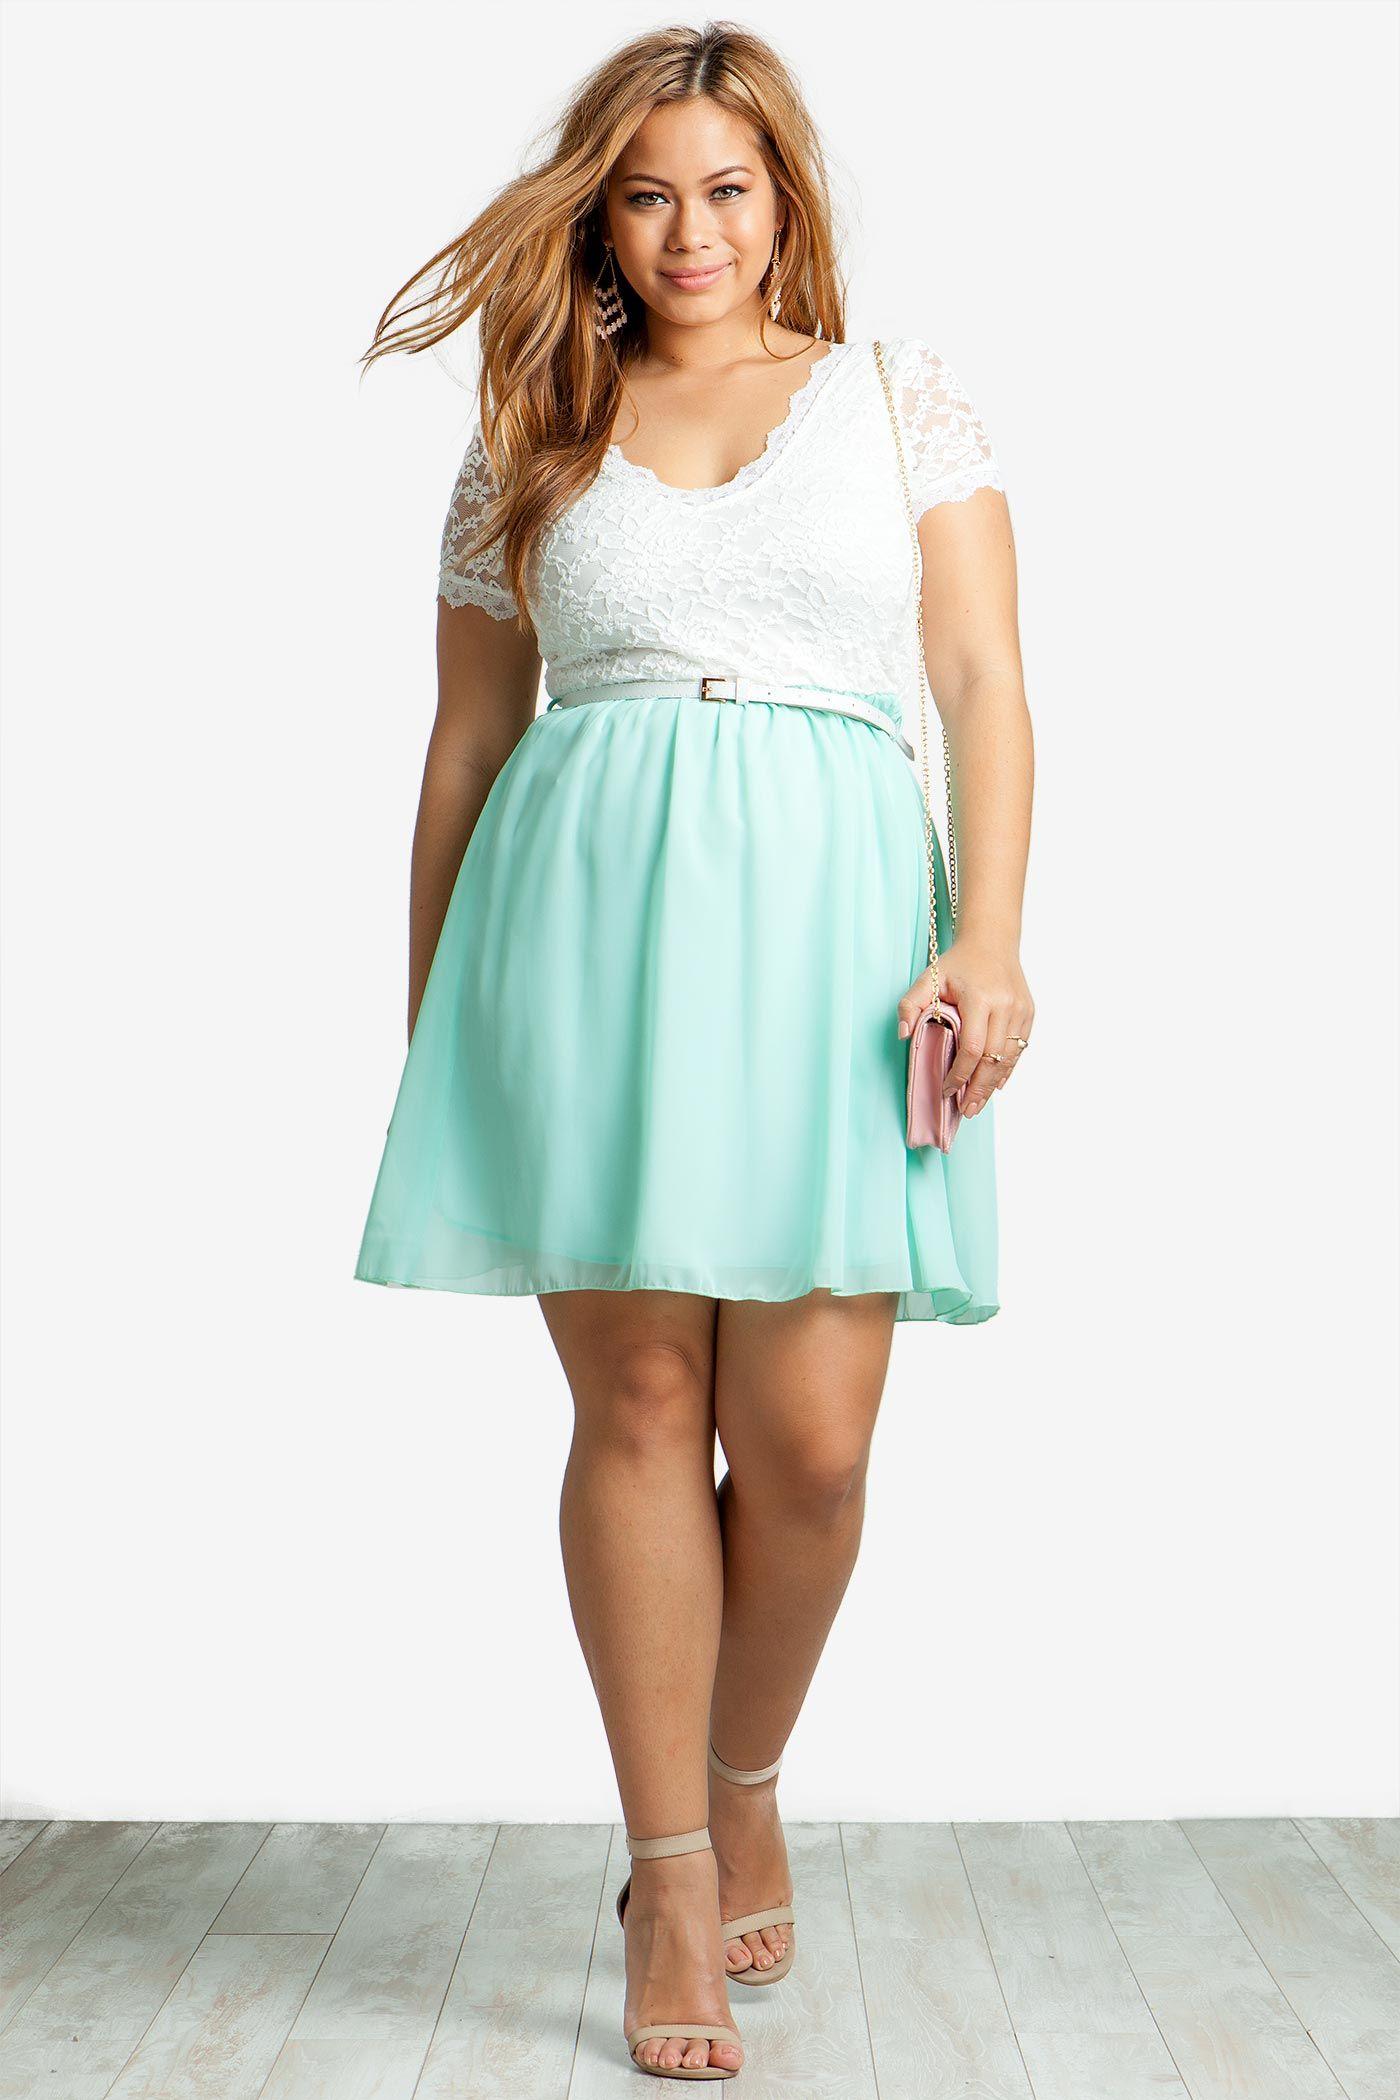 Women\'s Party Dresses | Sweet Lace V-Neck Flare Dress | A\'GACI ...